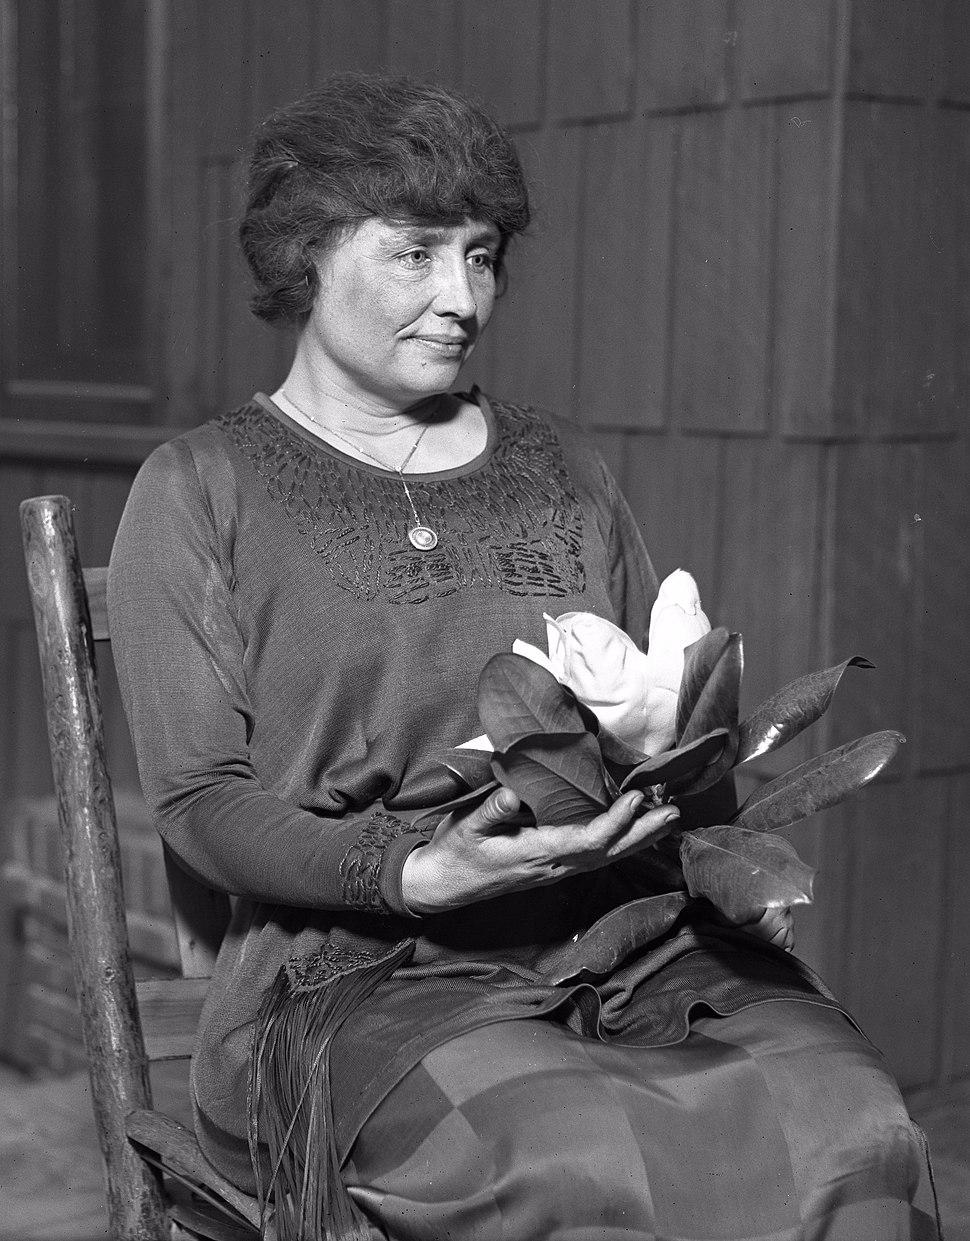 Hellen Keller circa 1920